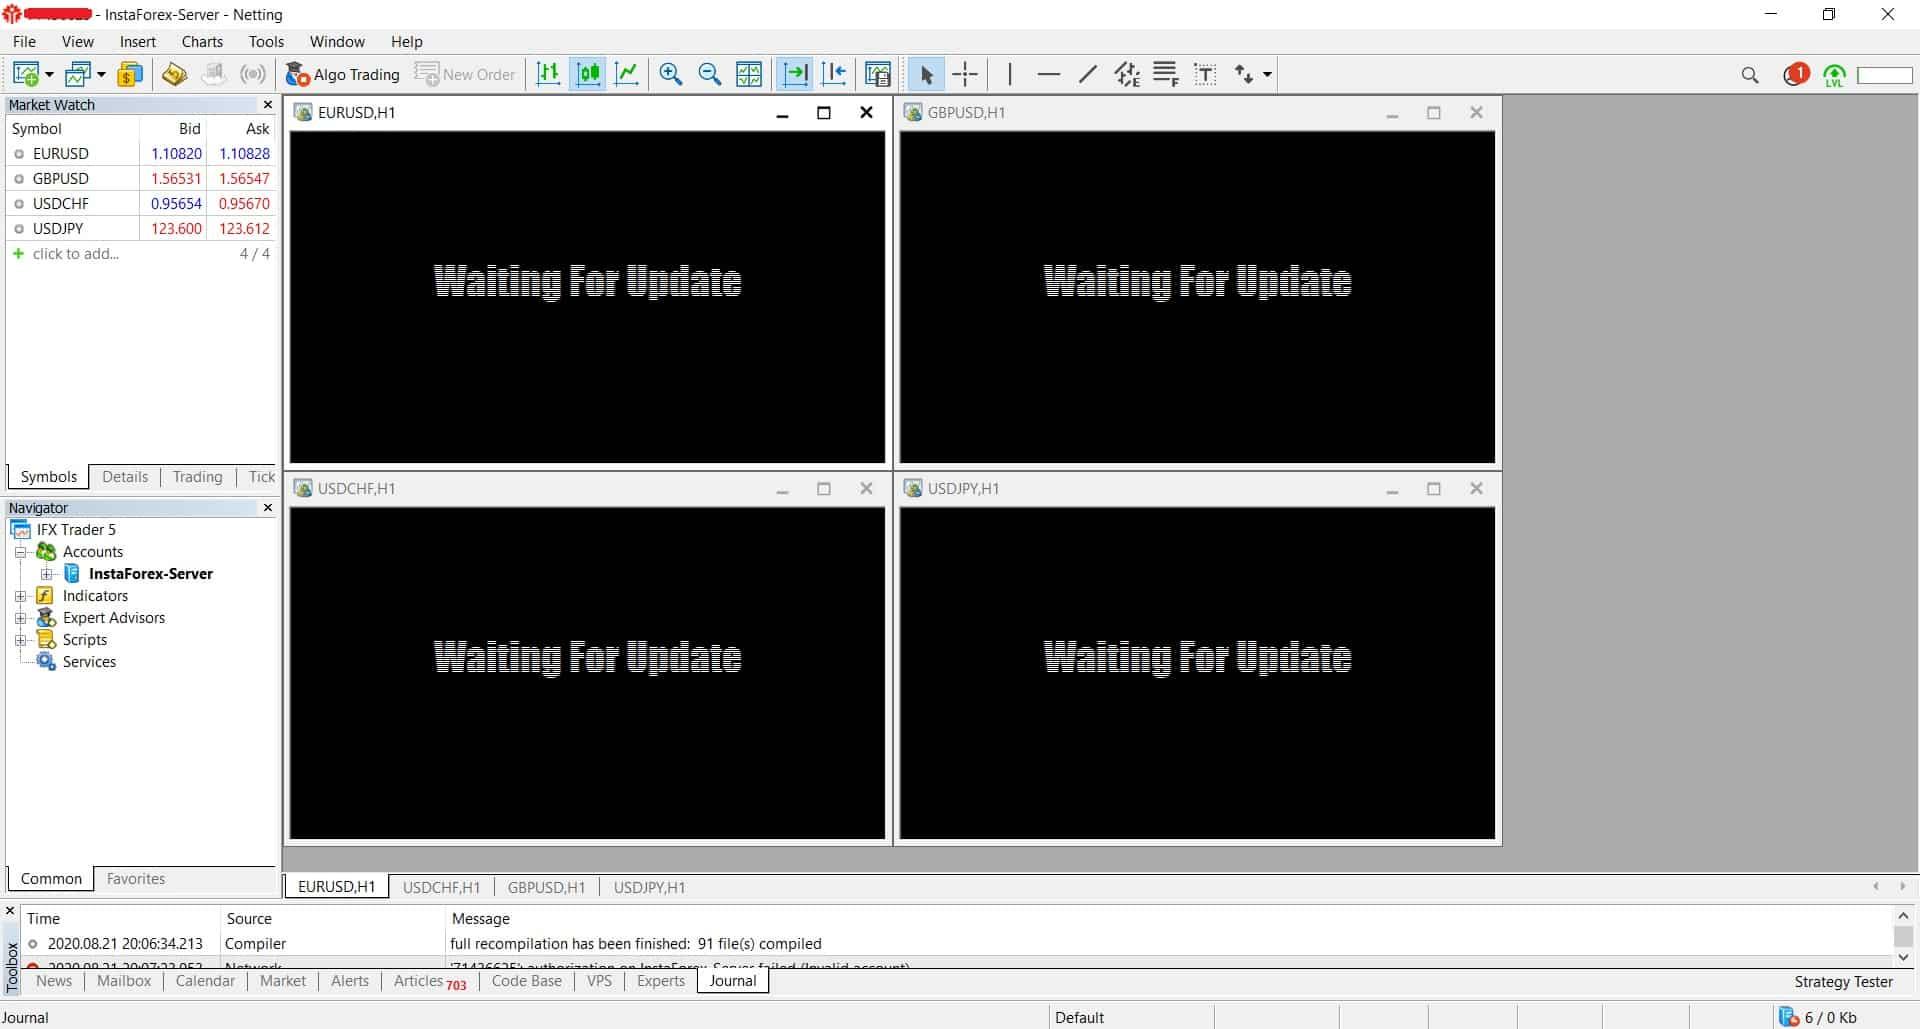 InstaForex MetaTrader 5 platform